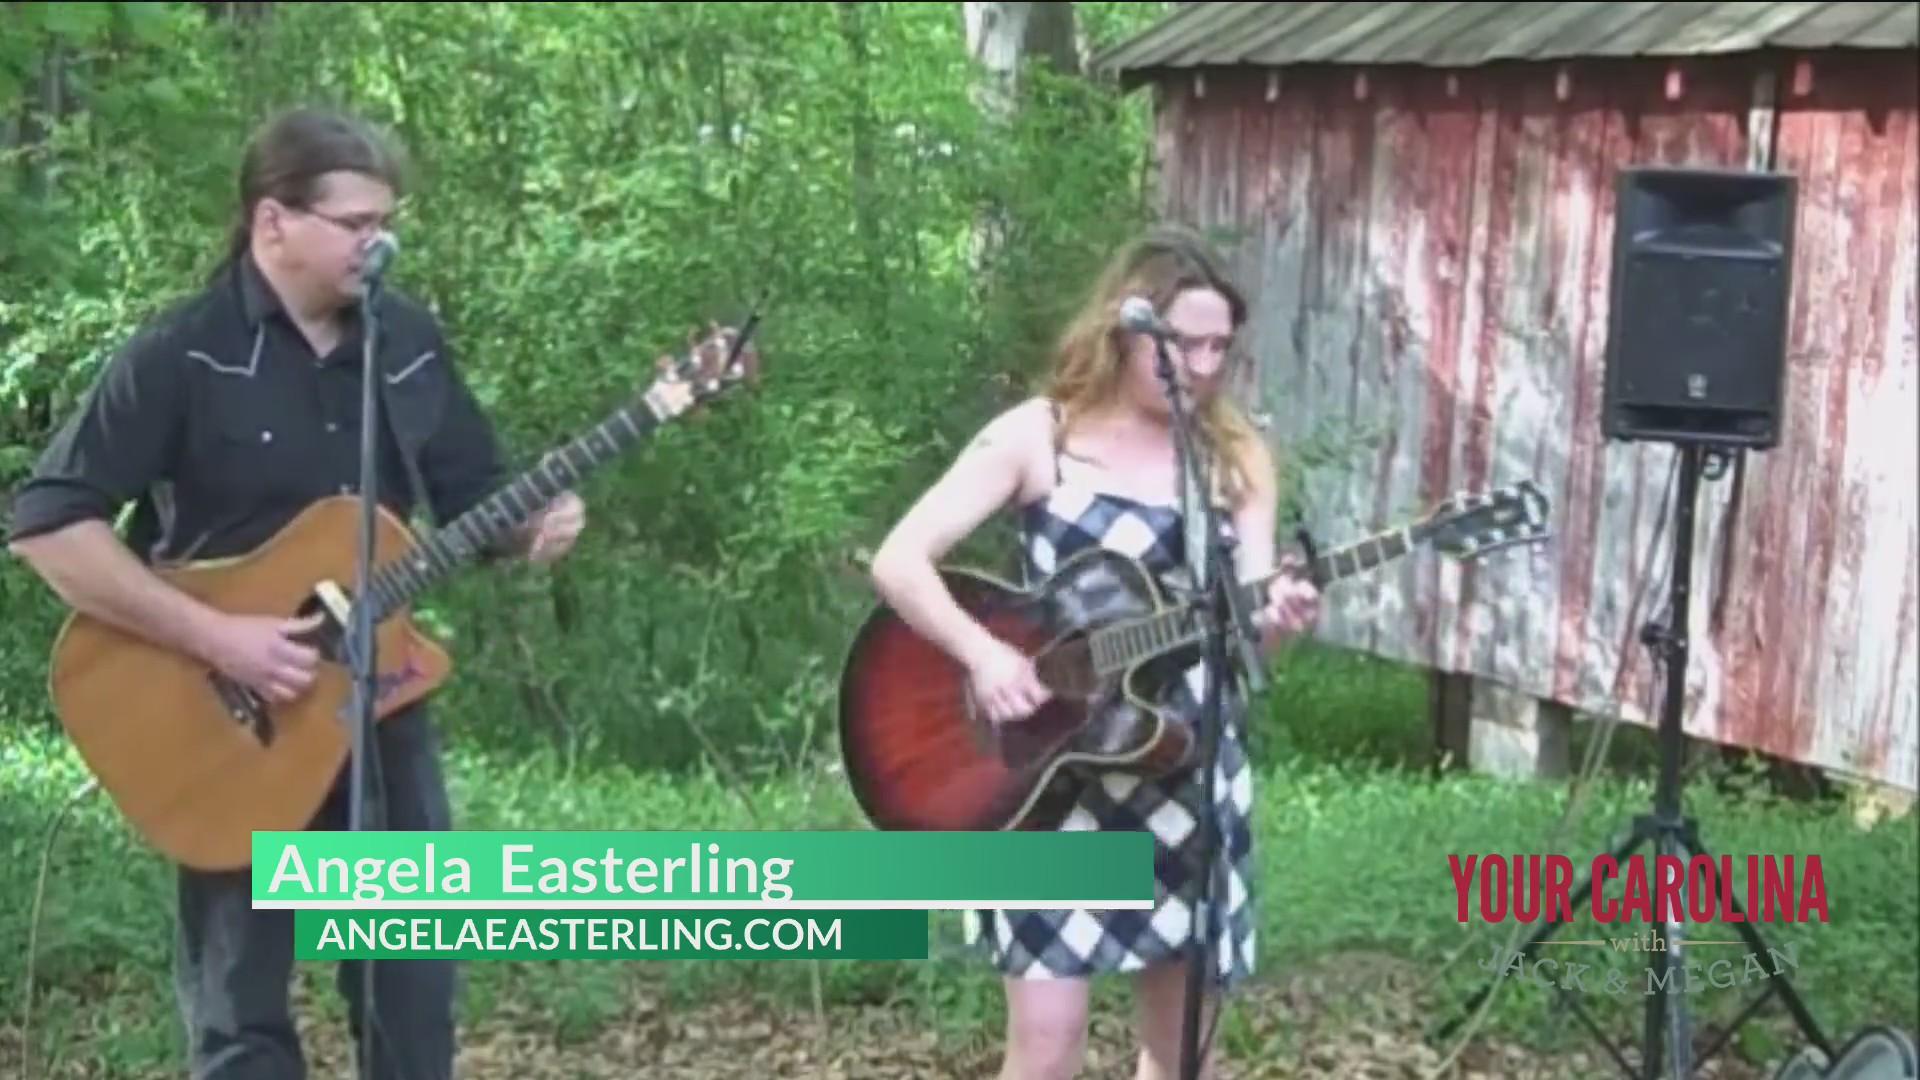 Meet Local Musician Angela Easterling